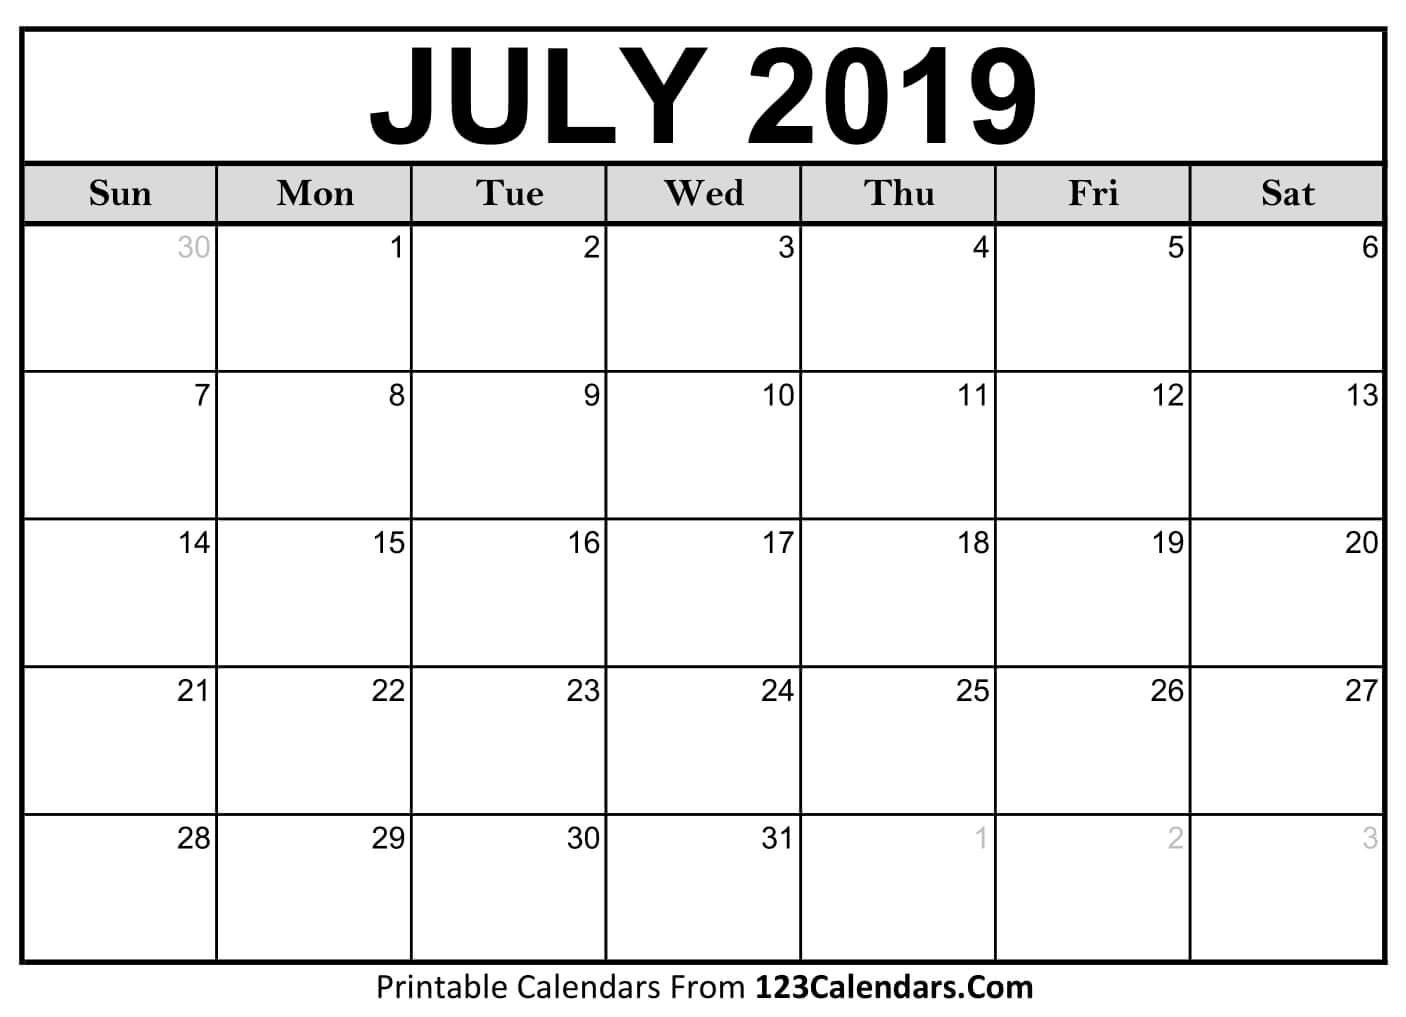 Printable July 2019 Calendar Templates - 123Calendars July 2019 Calendar